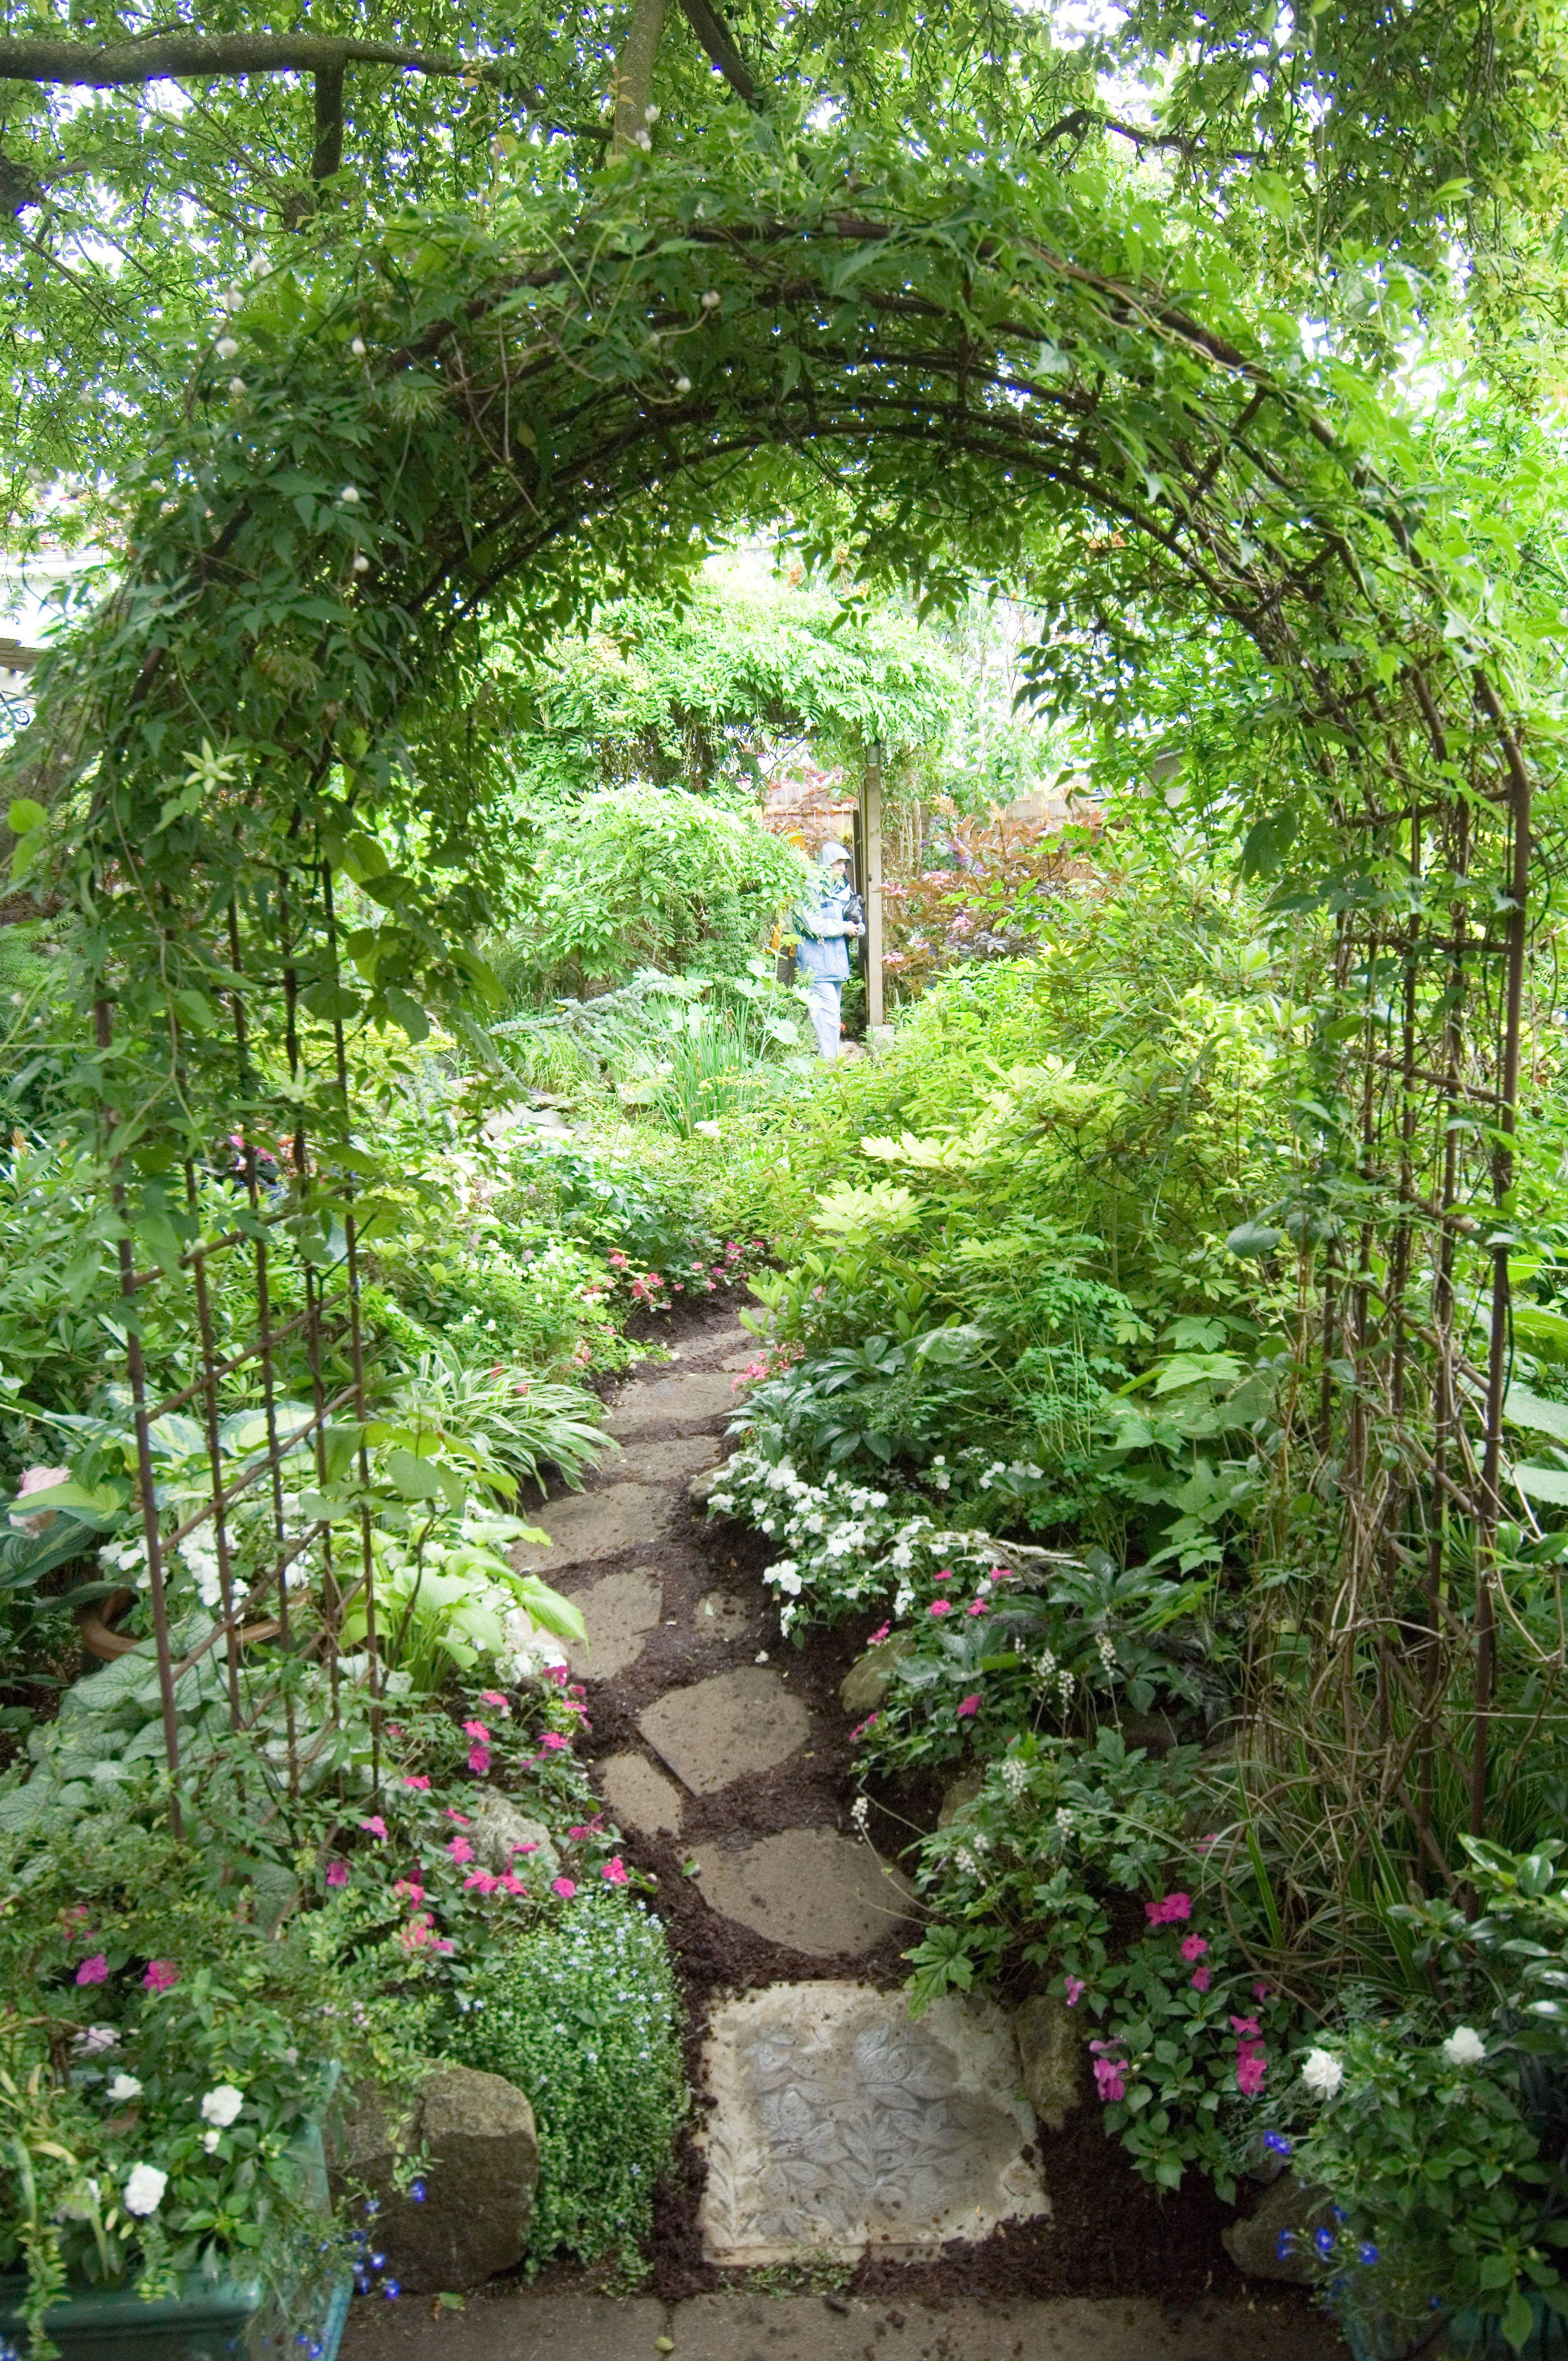 25 FLOWERS THAT MAKE AWESOME HANGING BASKETS | Gardening ...